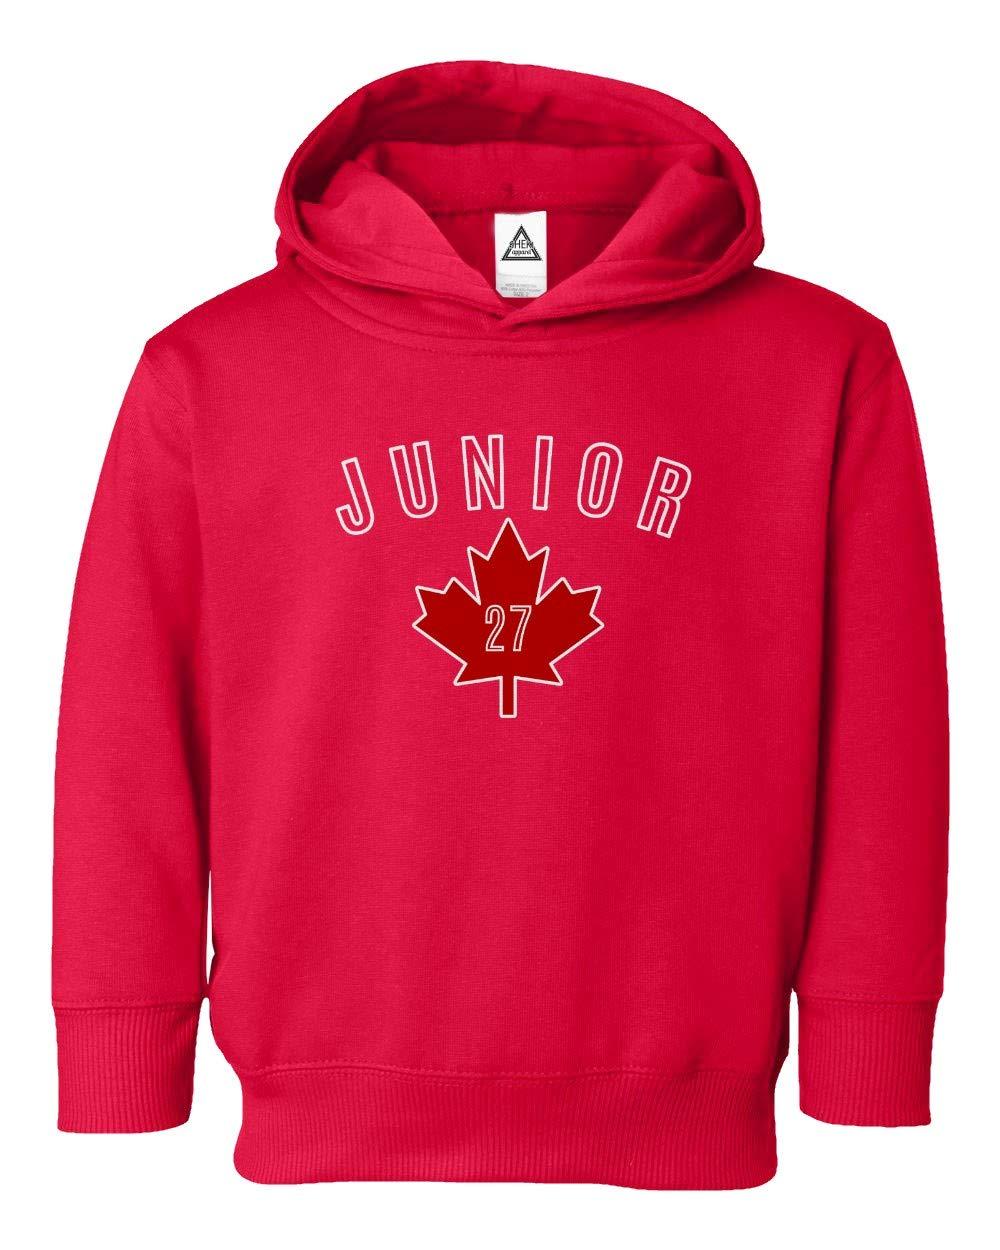 Baseball Toronto Fans Vladamir Vlad Jr Little Shirts